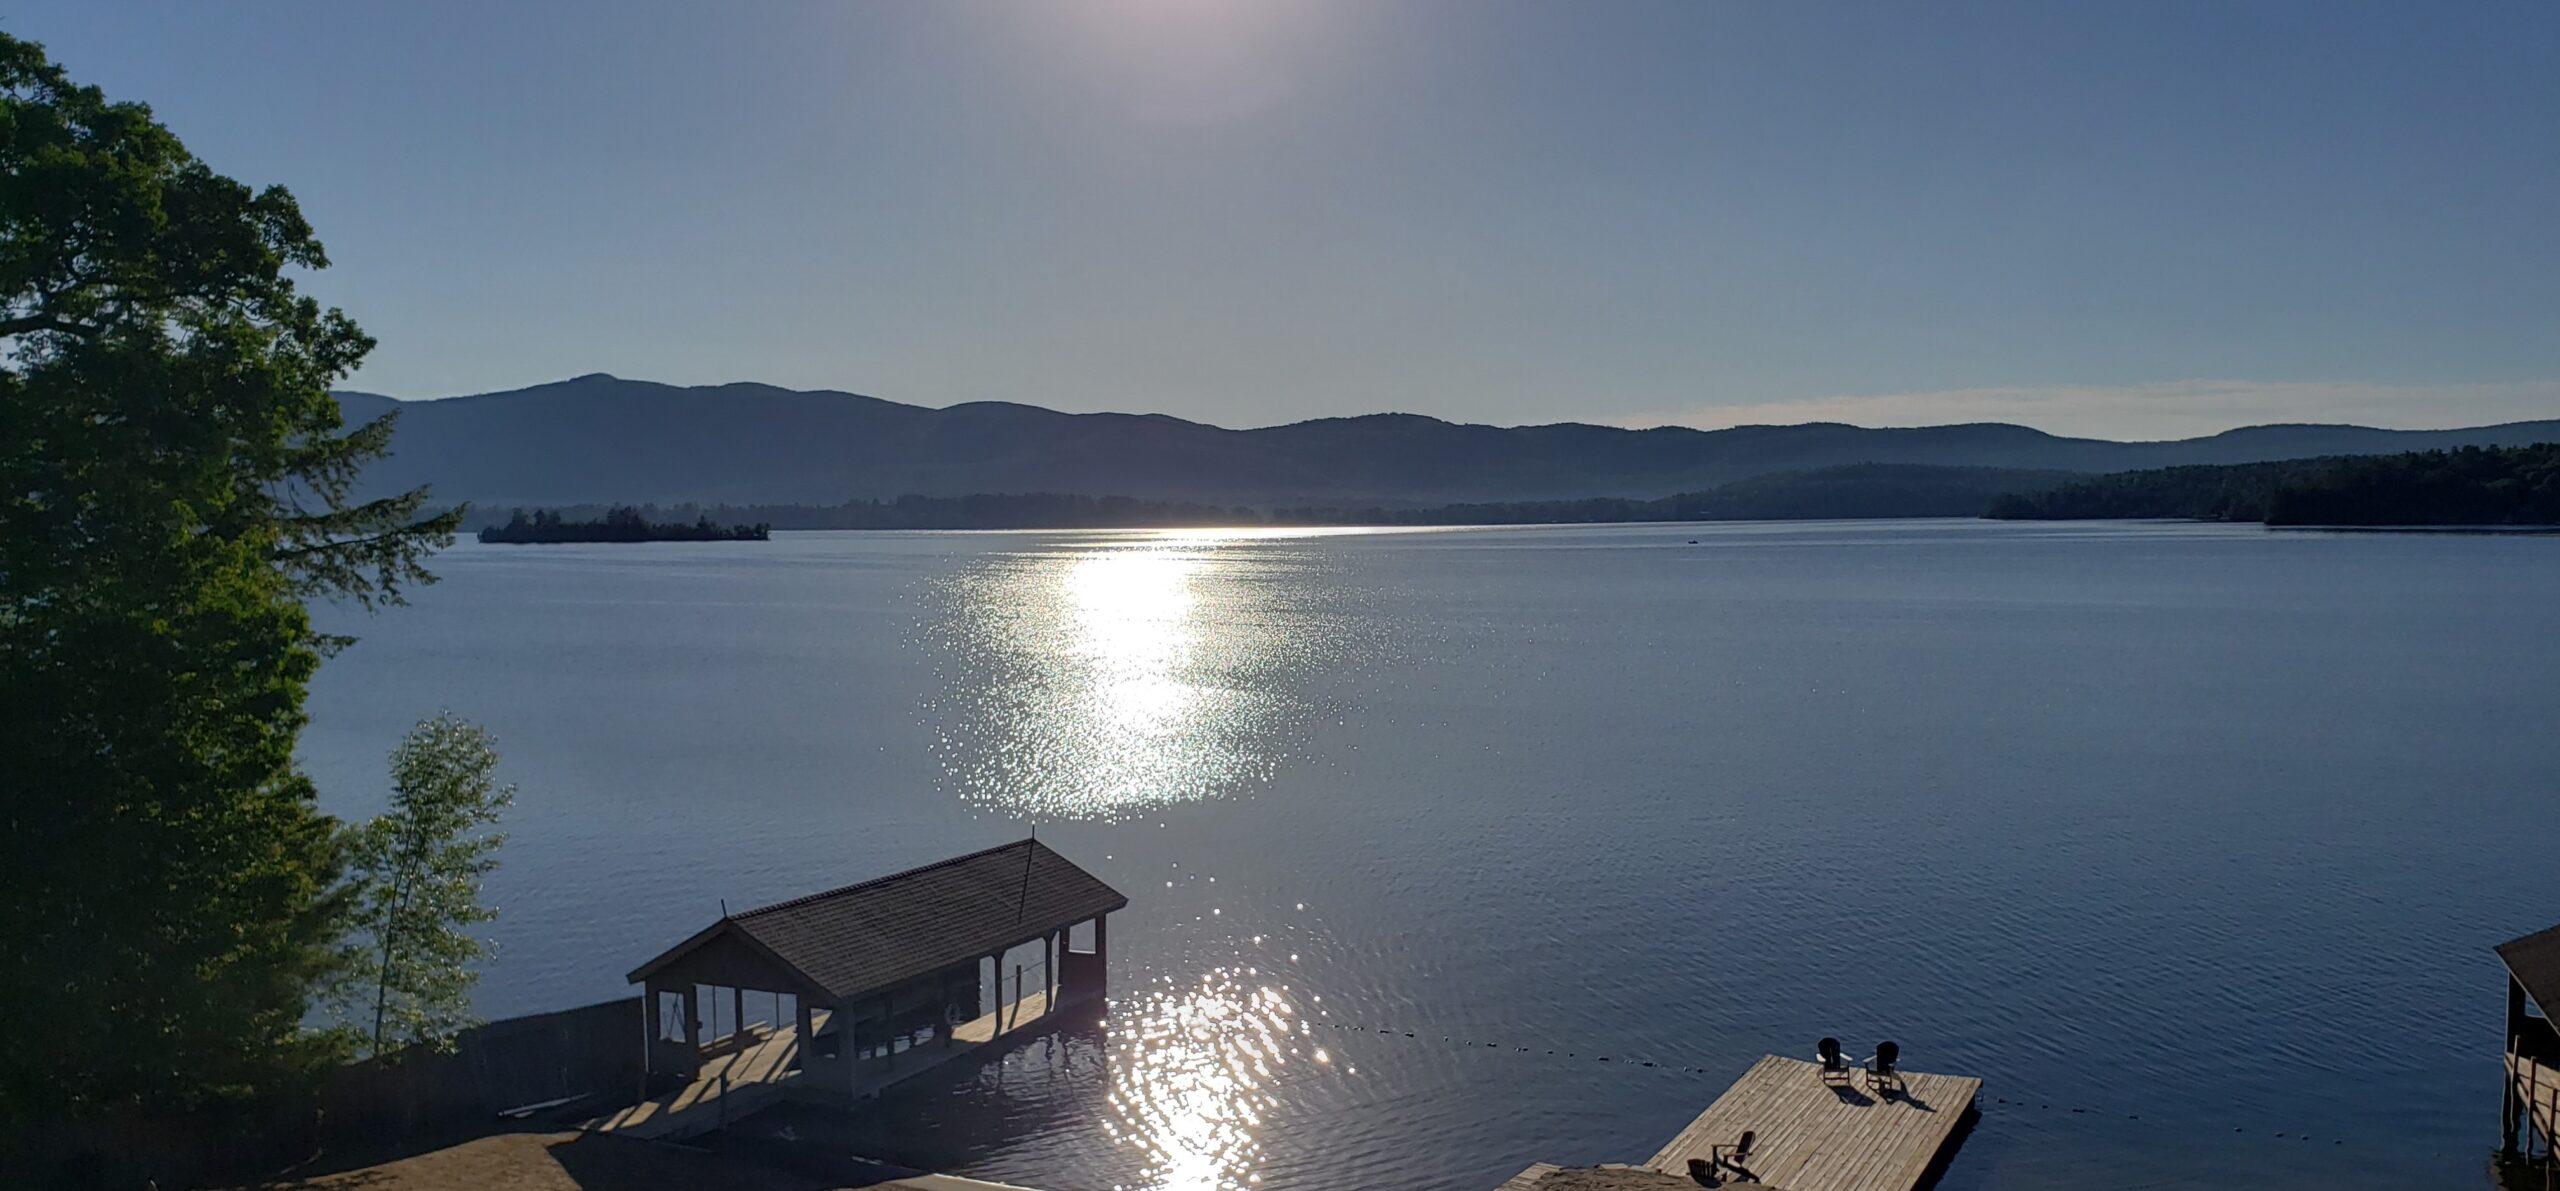 Lake George Resort View